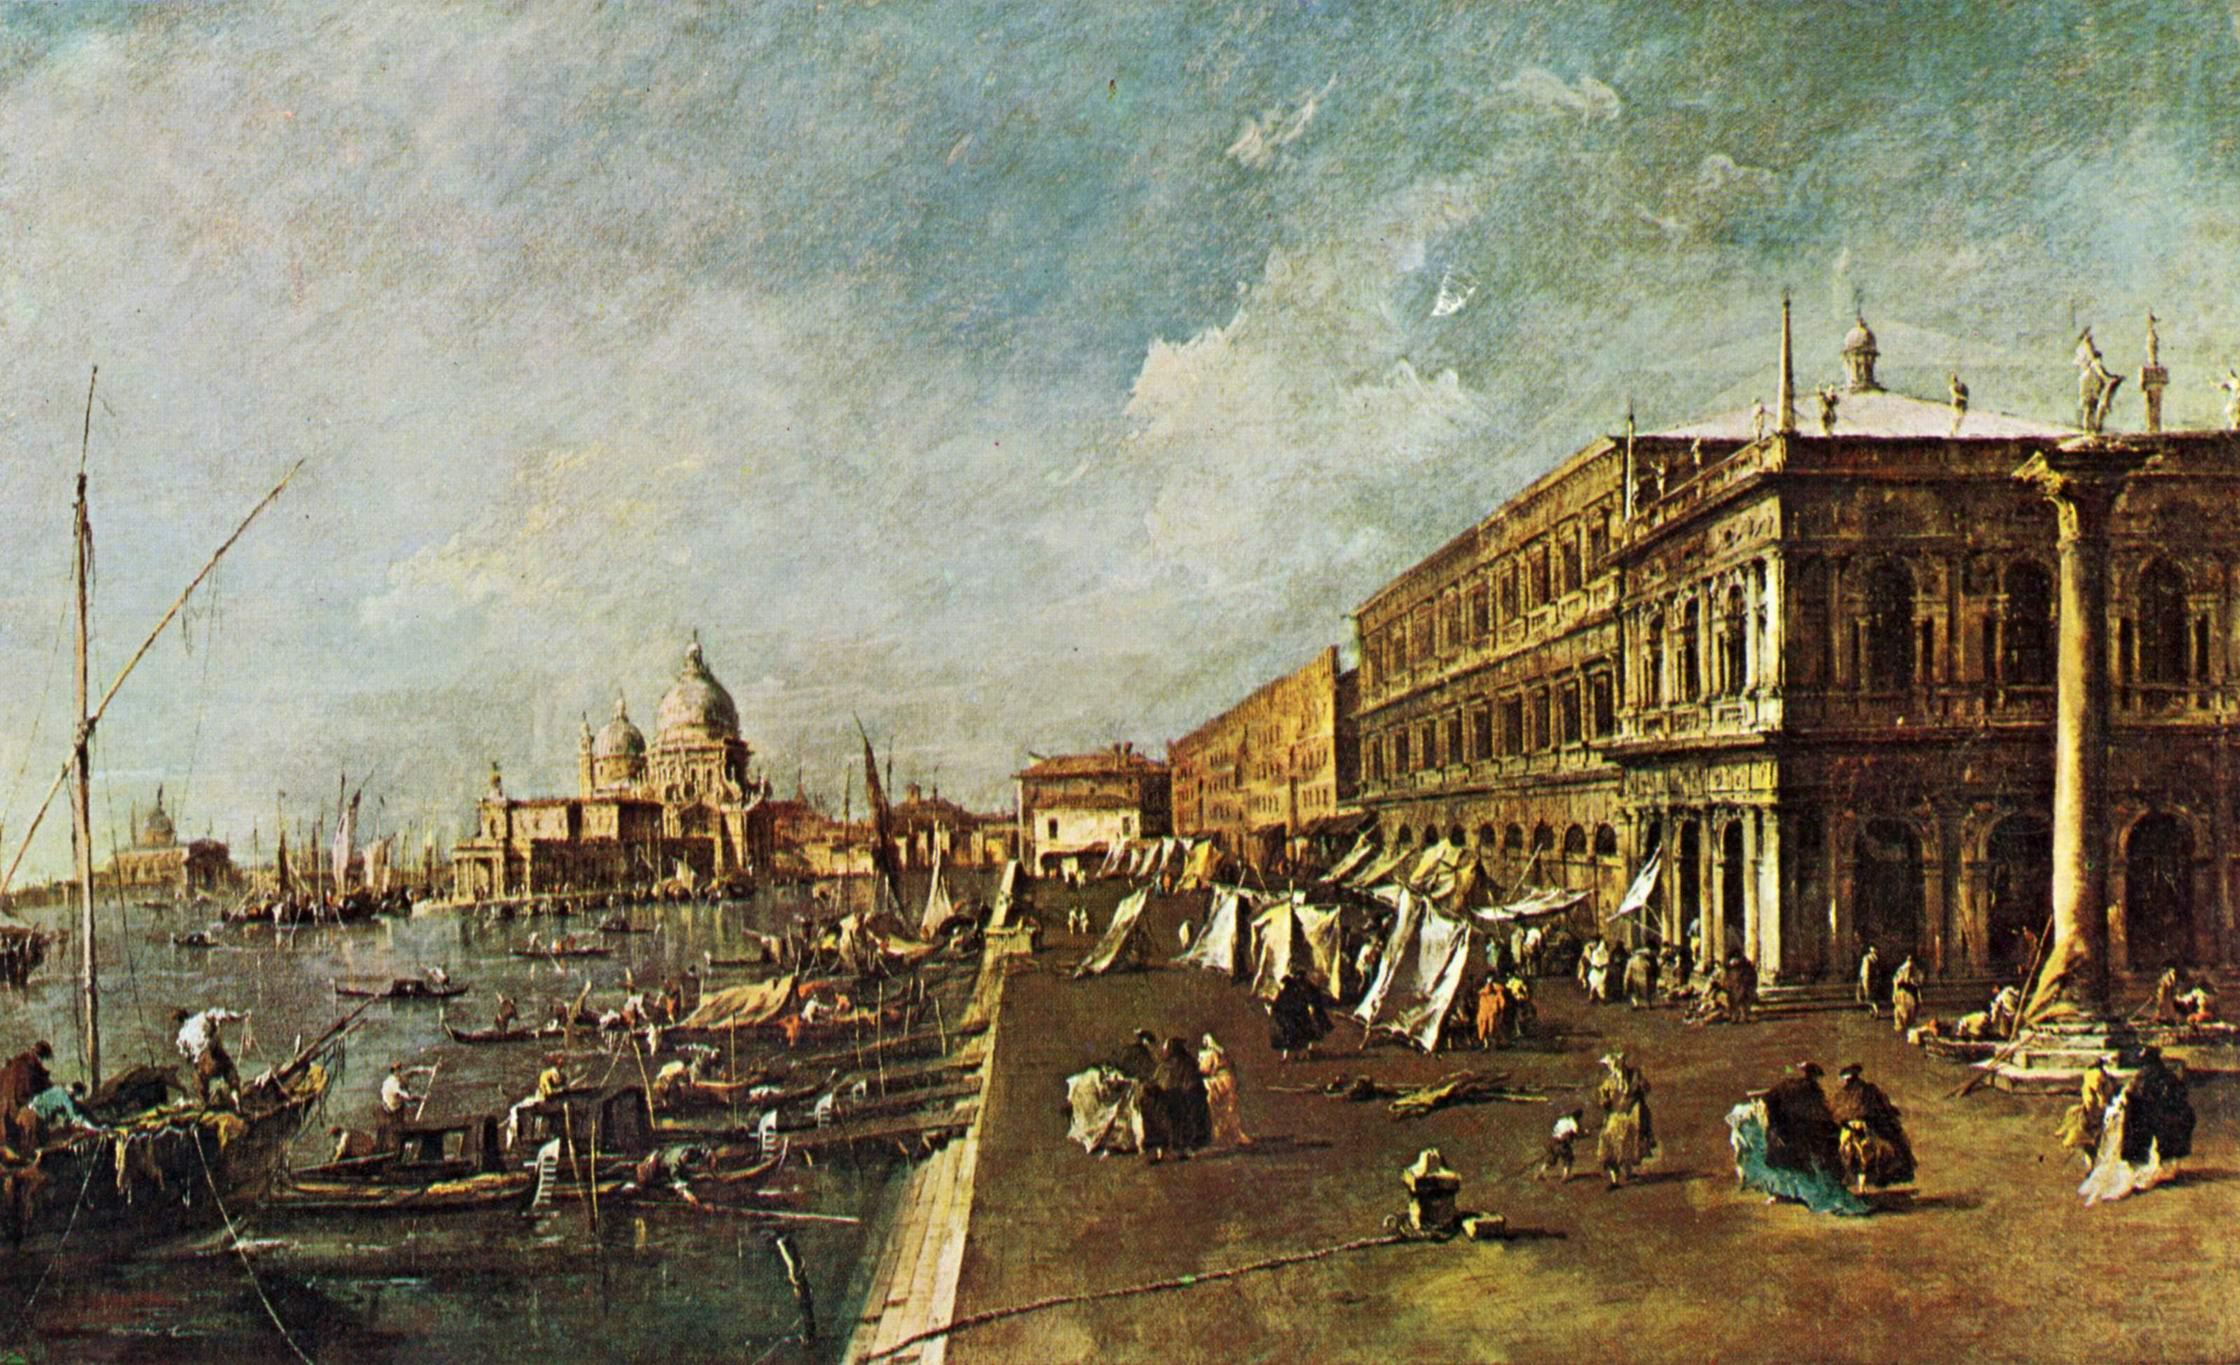 Мол с книжными лавками в Венеции с видом на церковь Салюте, Франческо Гварди